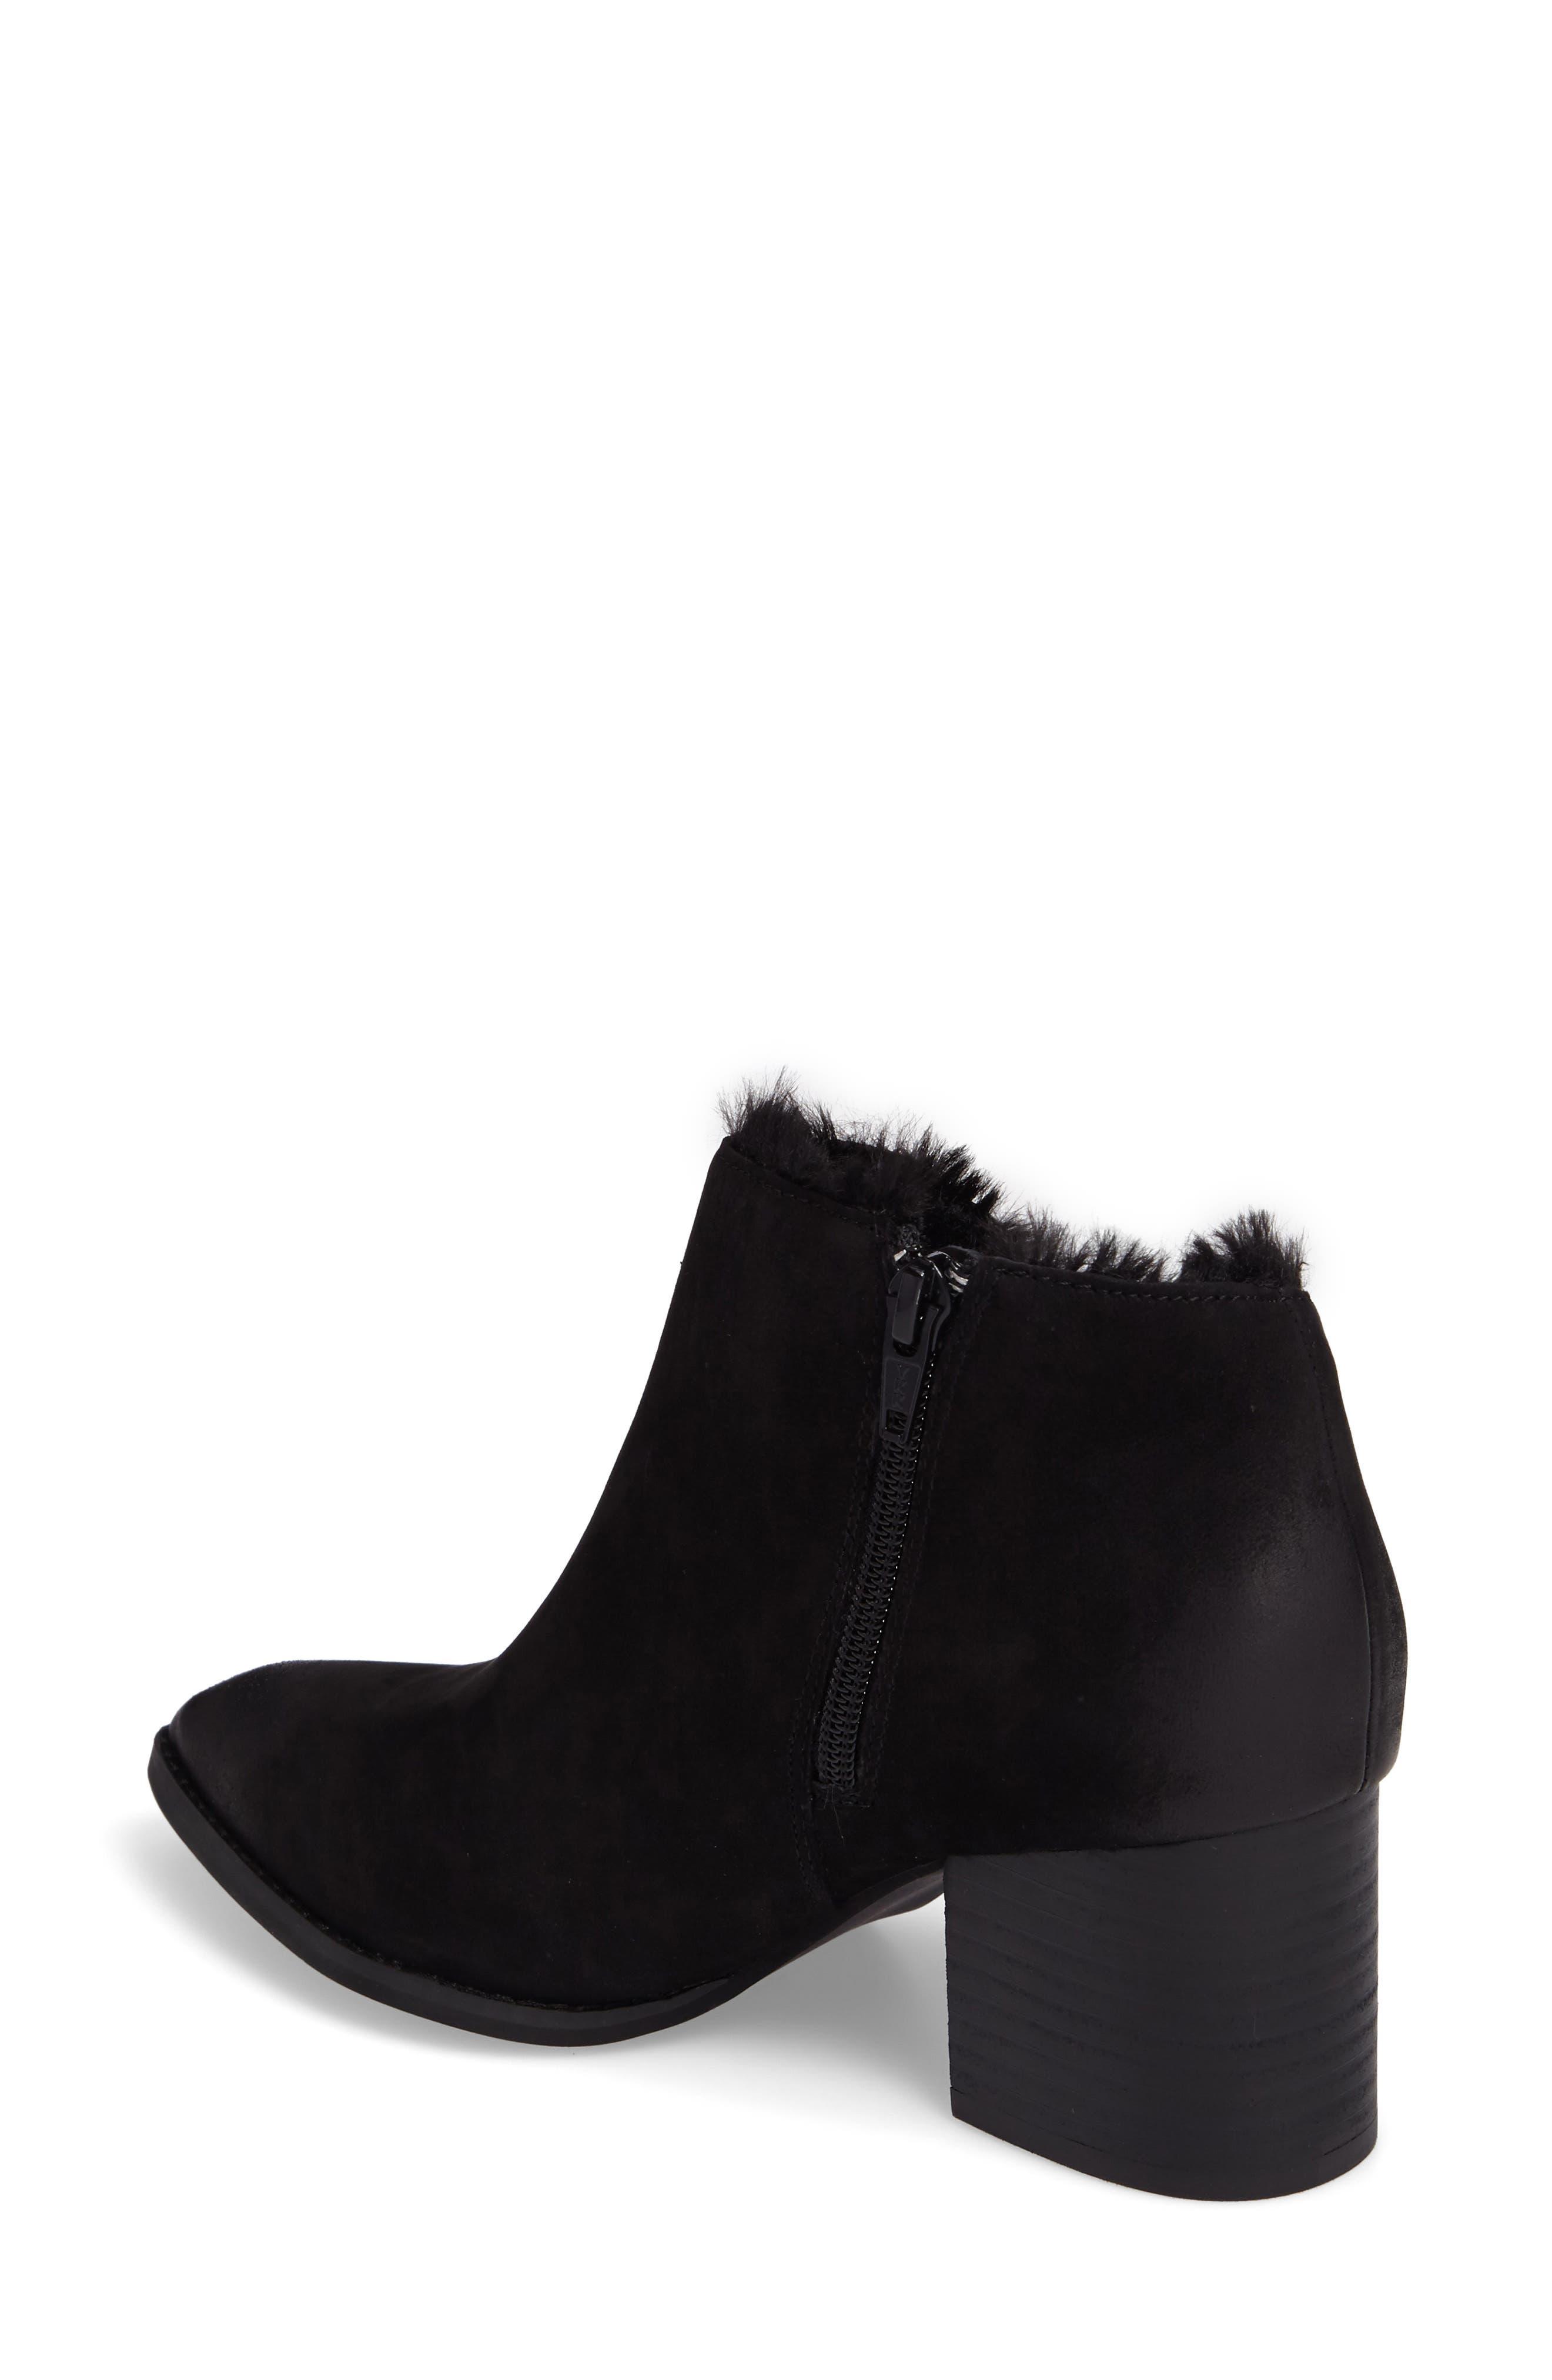 Preview Faux Fur Lined Bootie,                             Alternate thumbnail 2, color,                             Black Leather